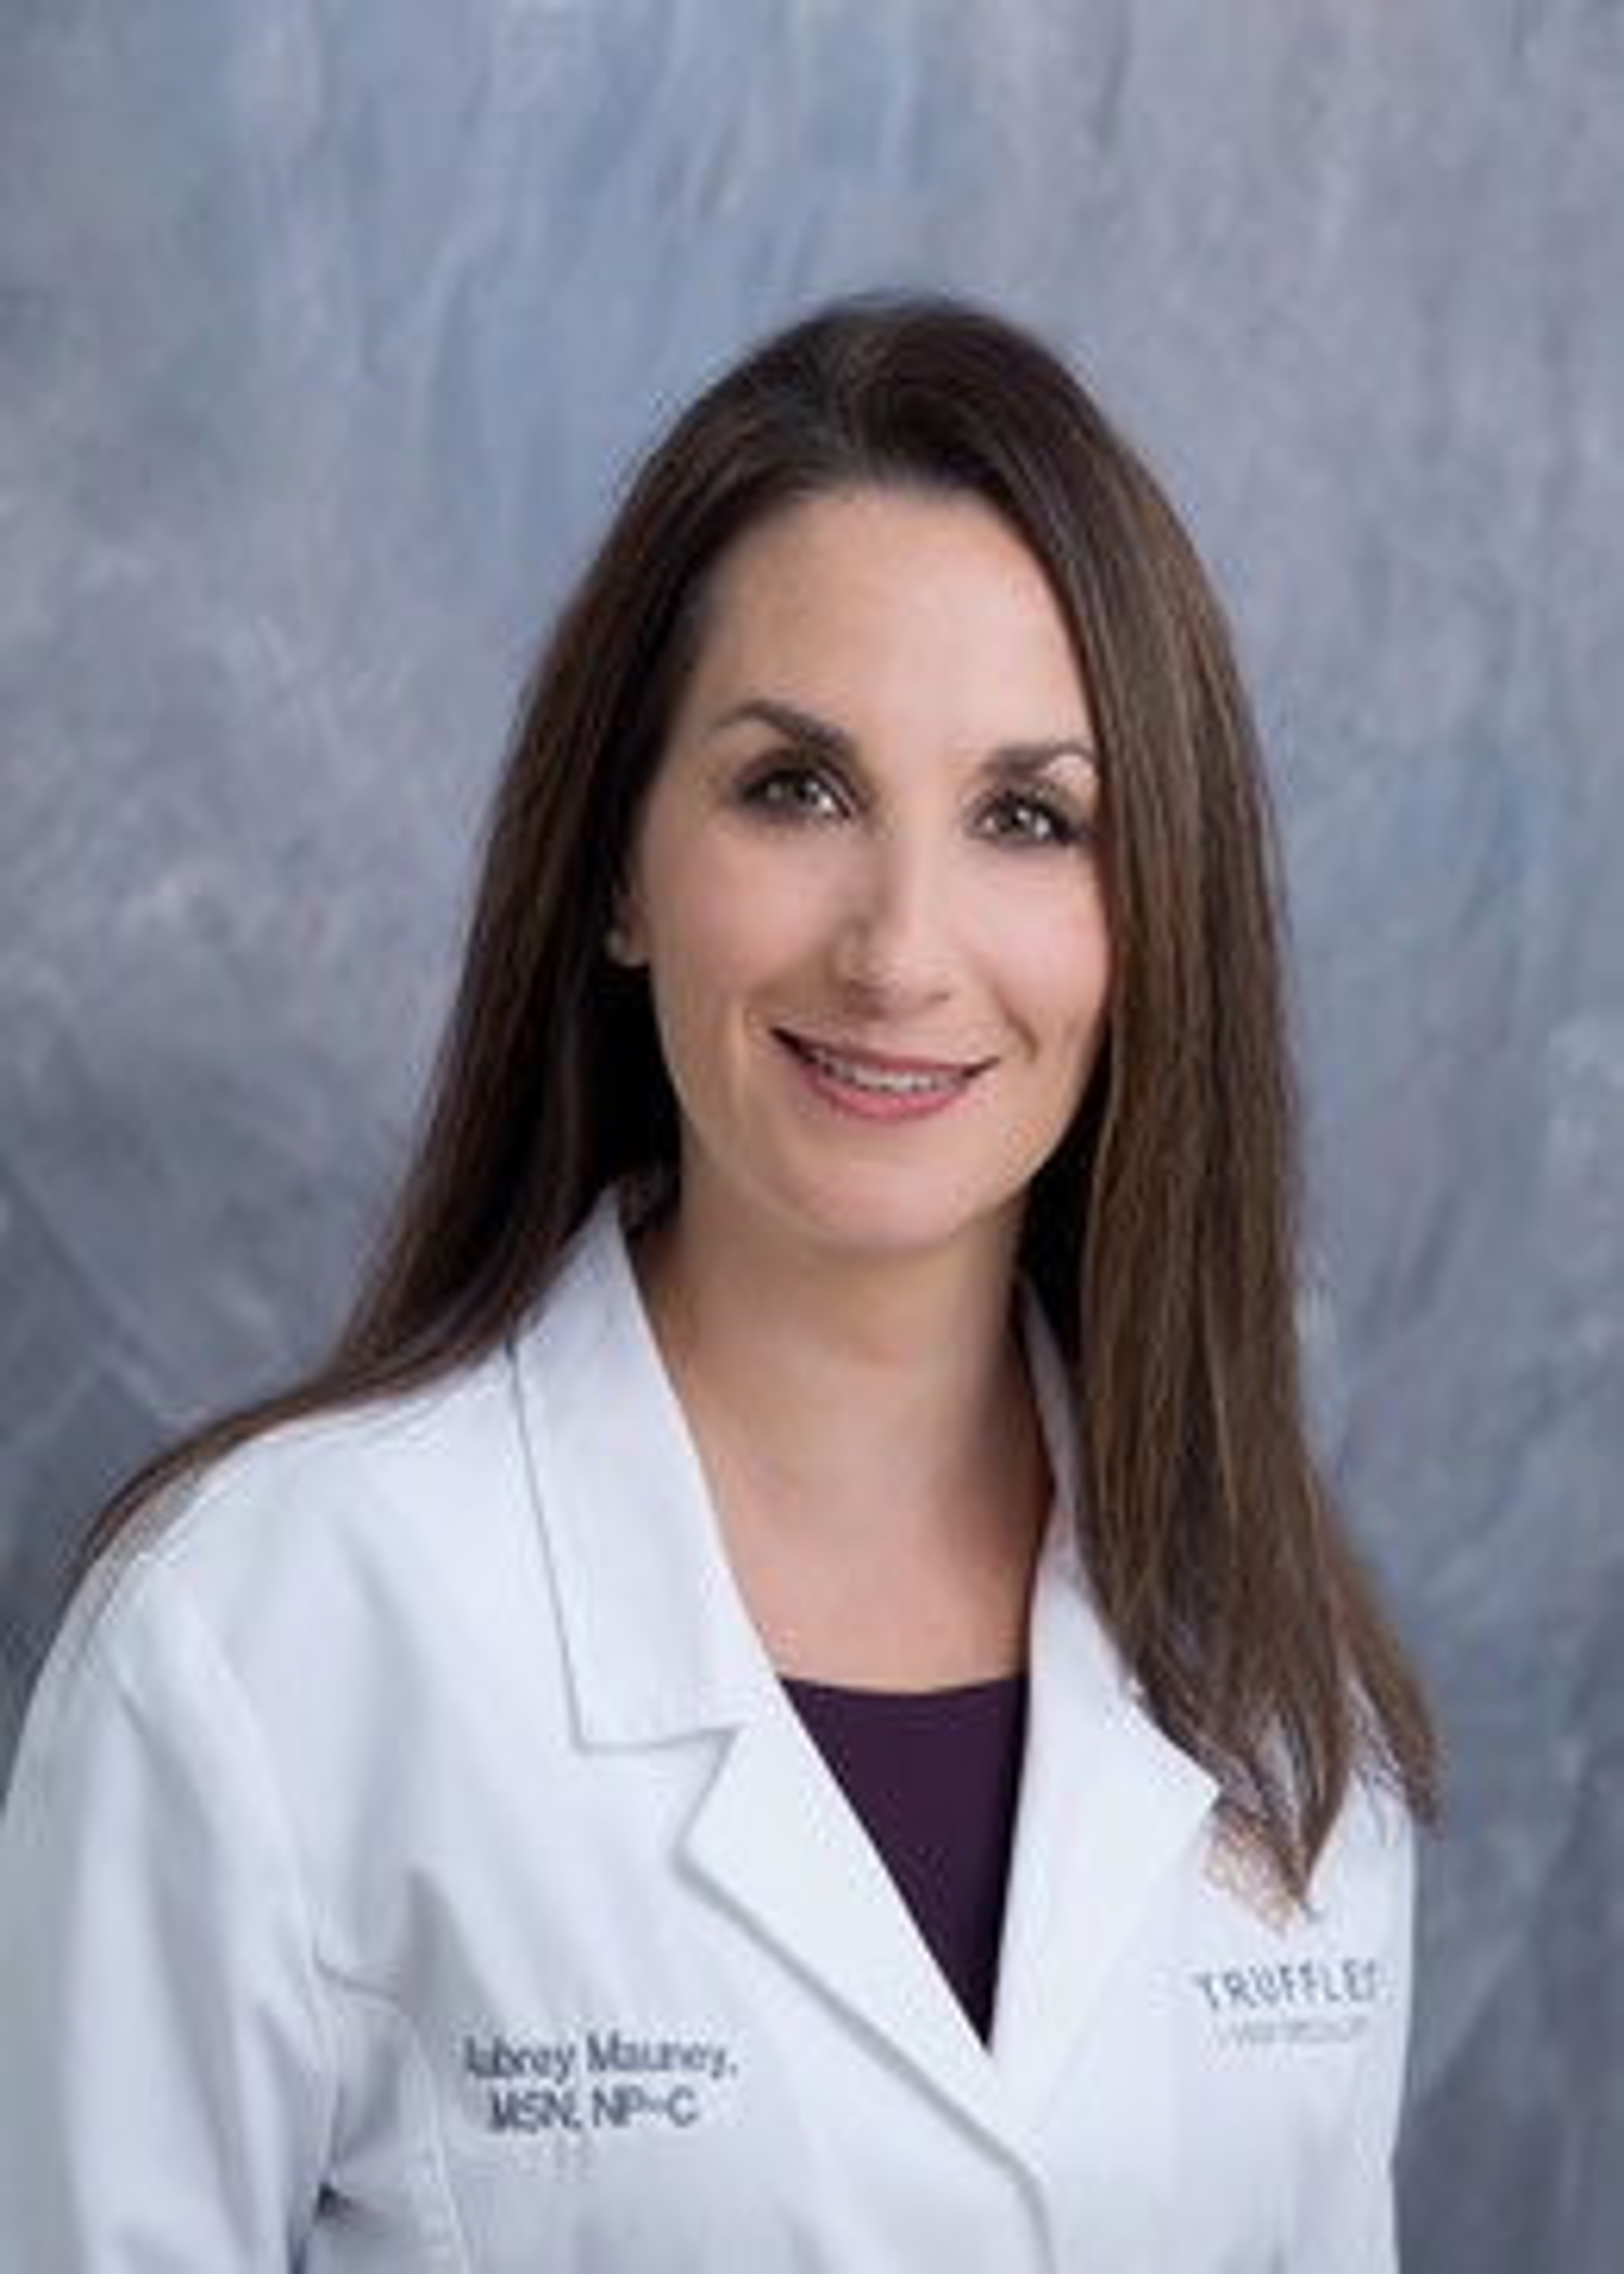 Aubrey Mauney, NP-C Lead nurse practitioner for Truffles Vein Specialists in Fayetteville, Georgia.